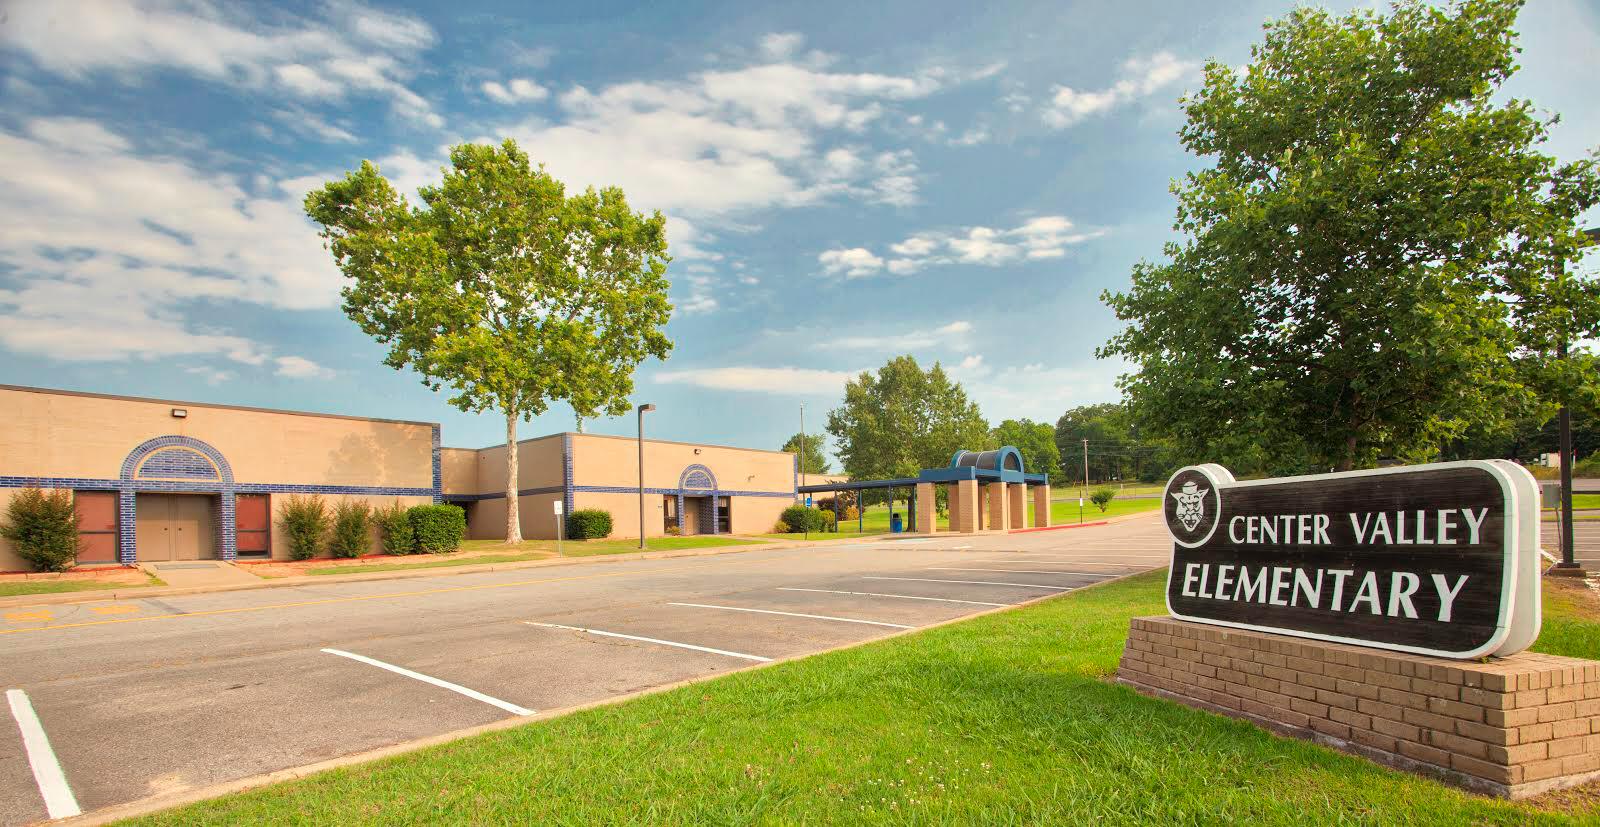 Center Valley Elementary